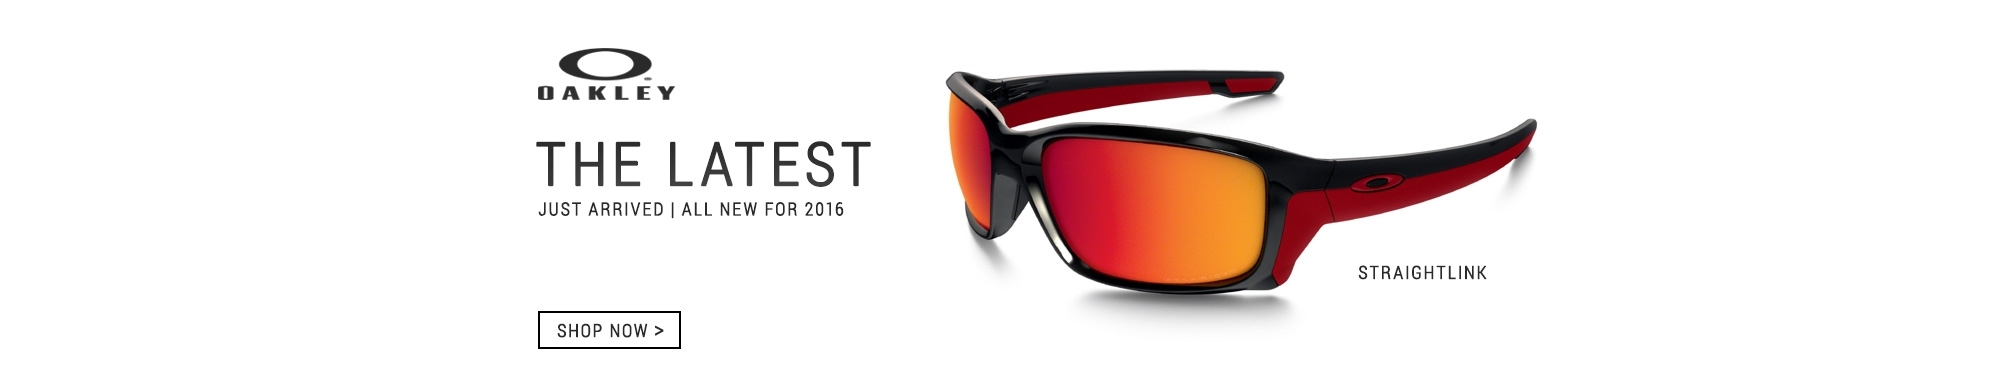 Latest Oakley Sunglasses - Straightlink